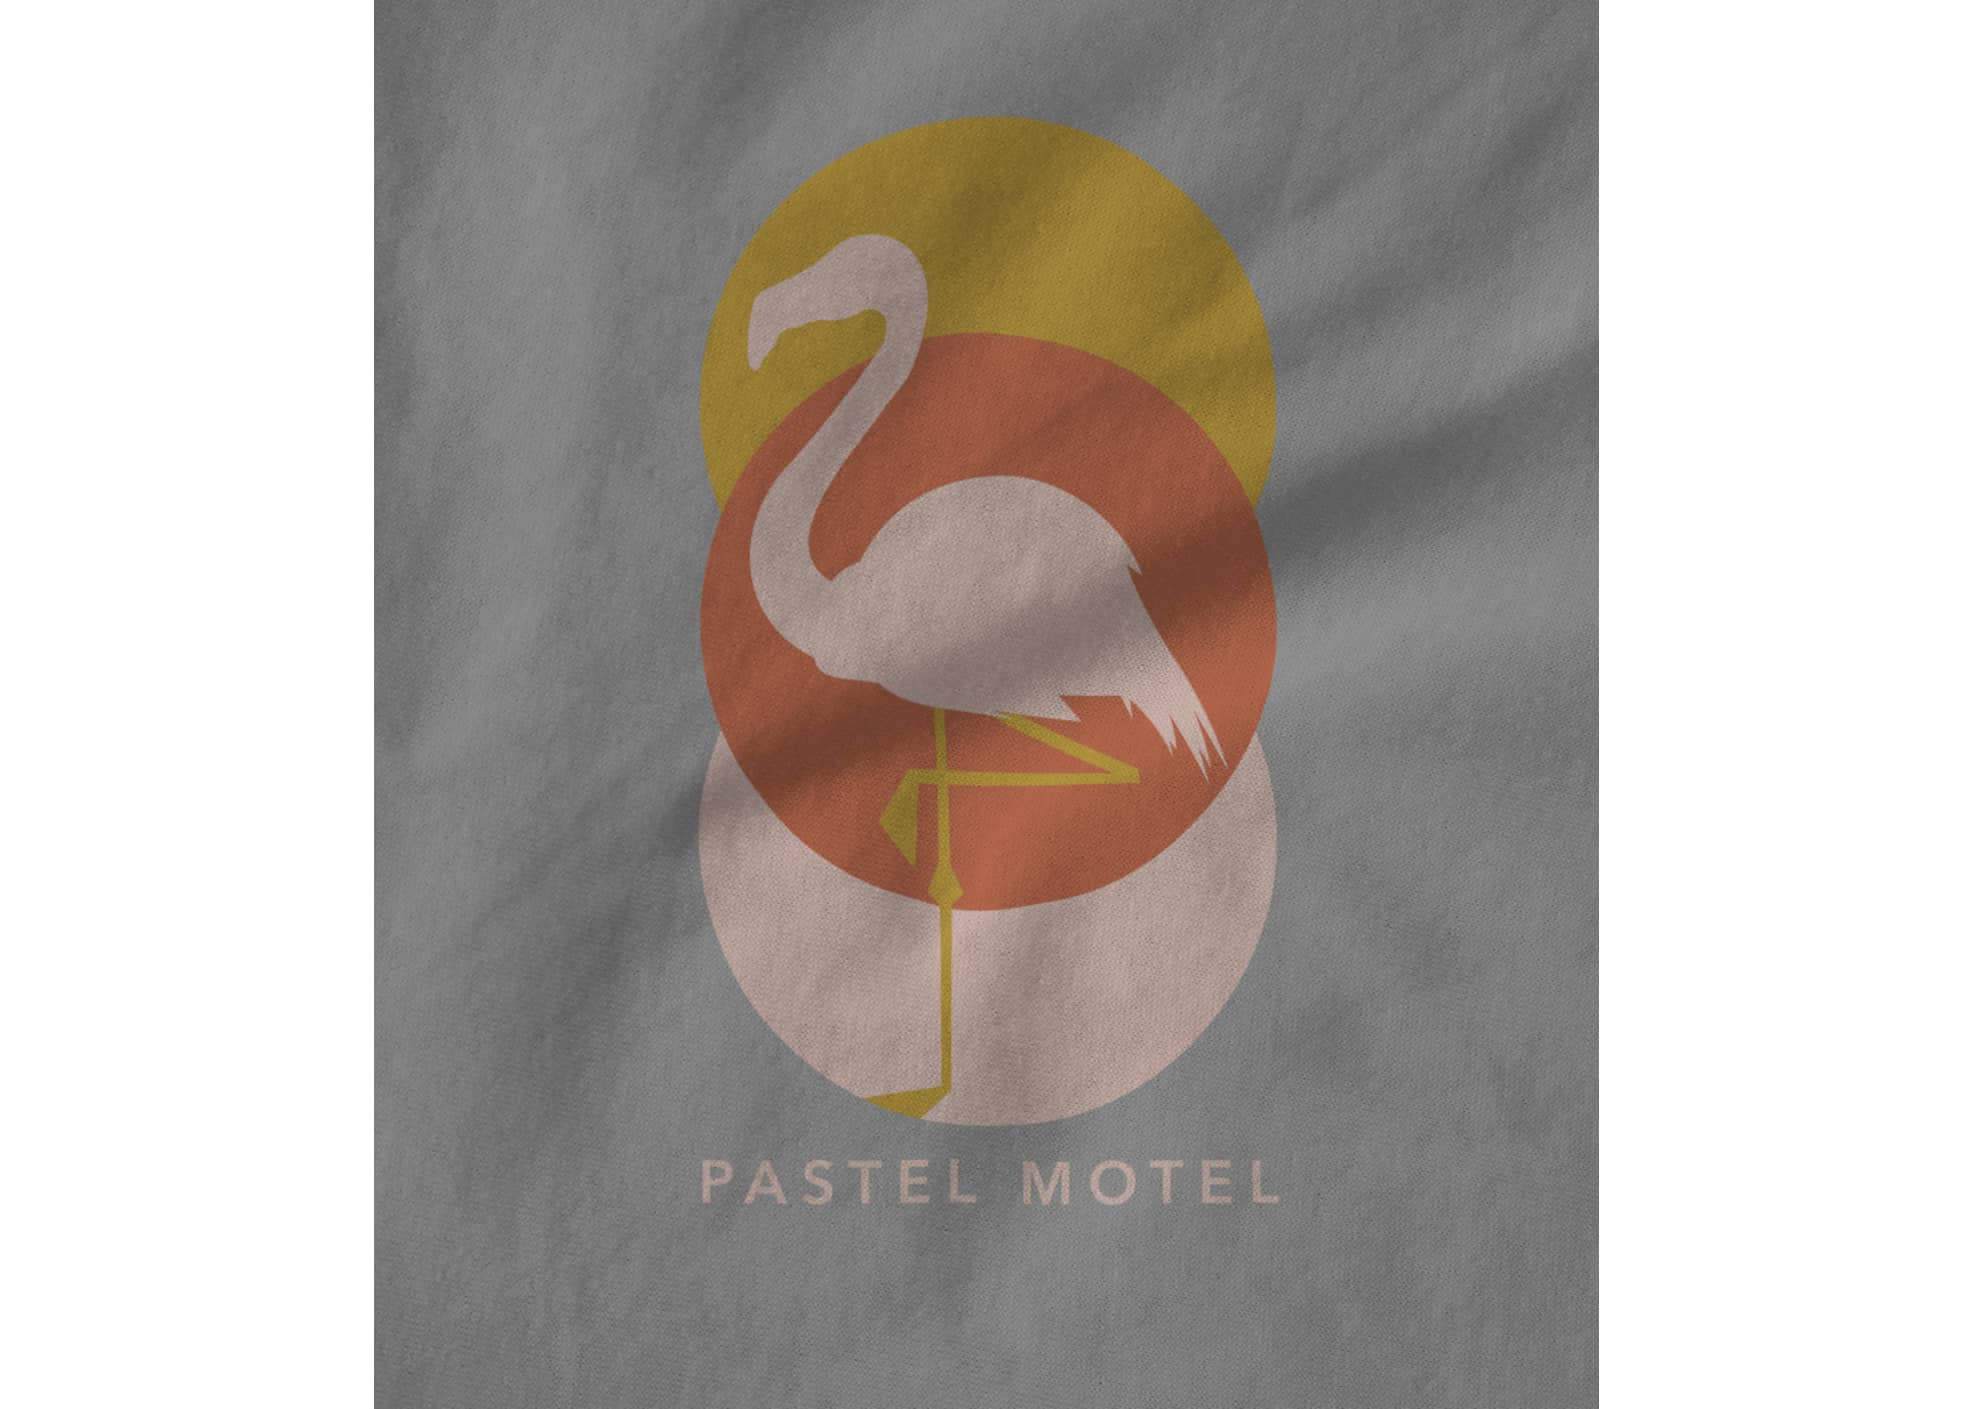 Pastel motel flamingo 1516315246